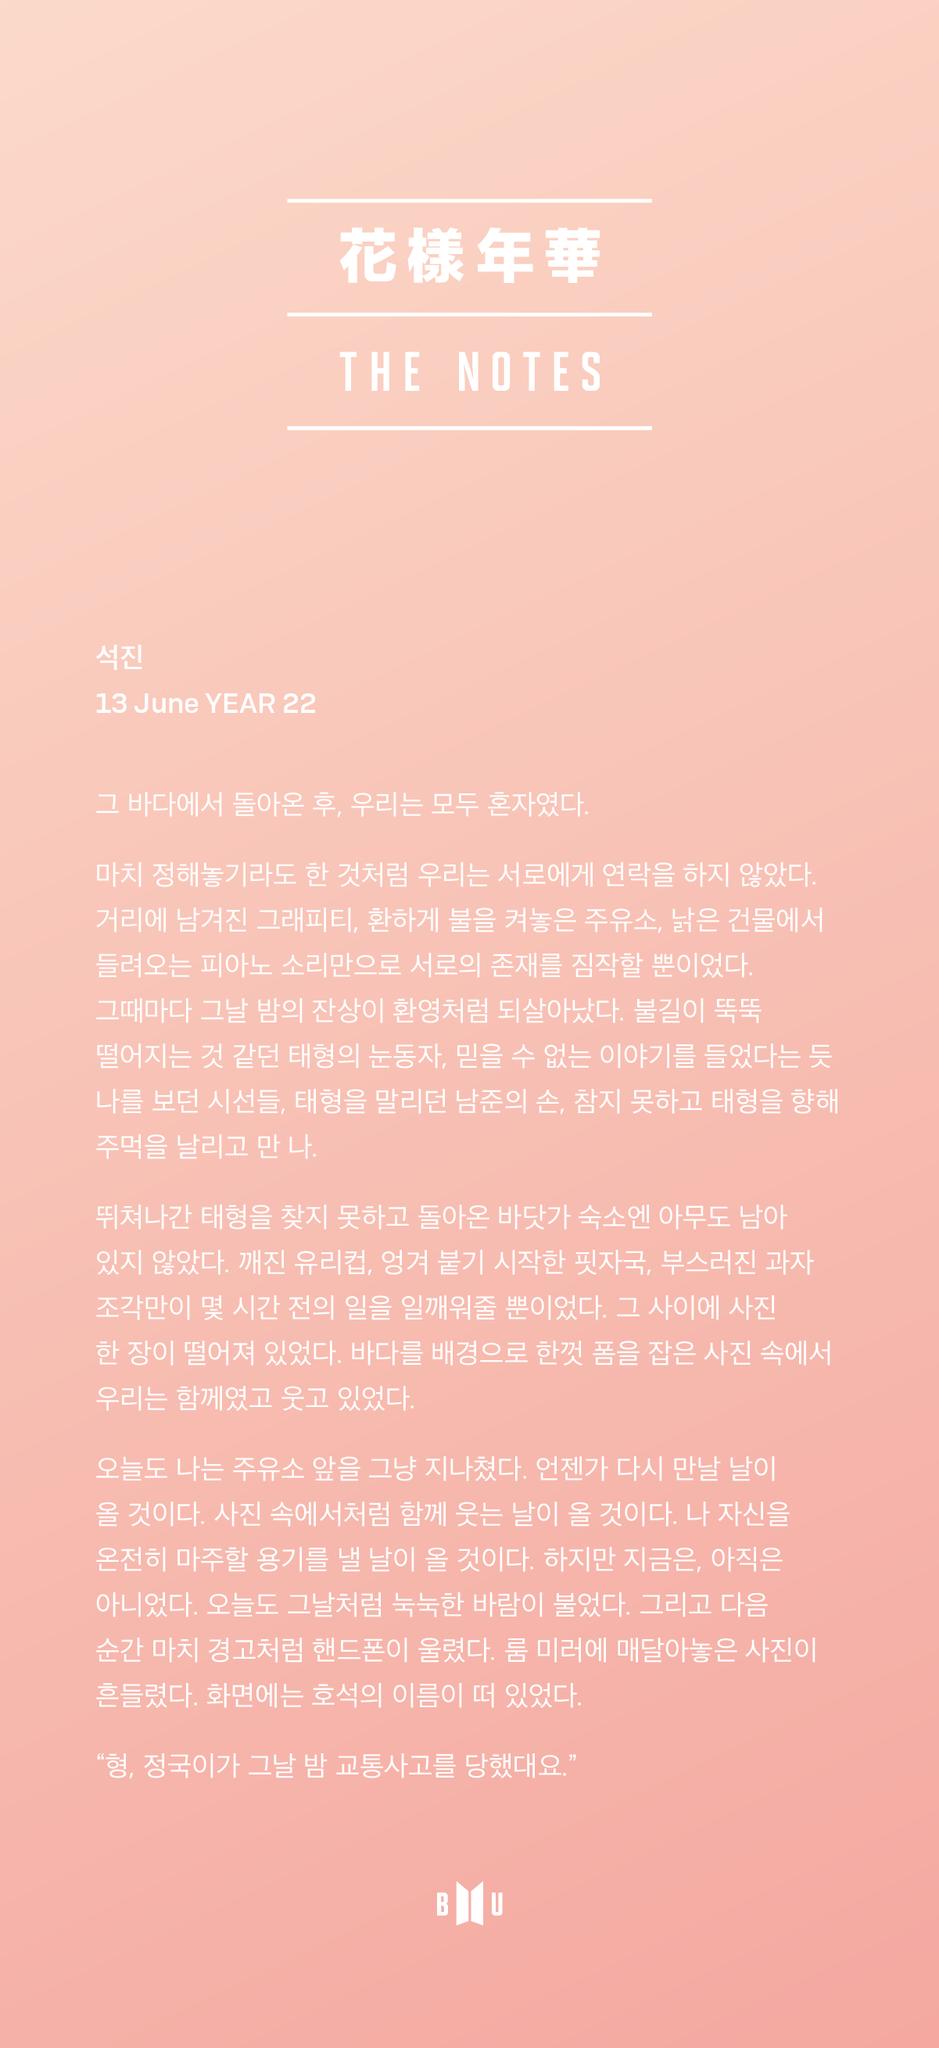 #BTS #방탄소년단 #화양연화TheNotes https://t.co/uWiXlXt9gC